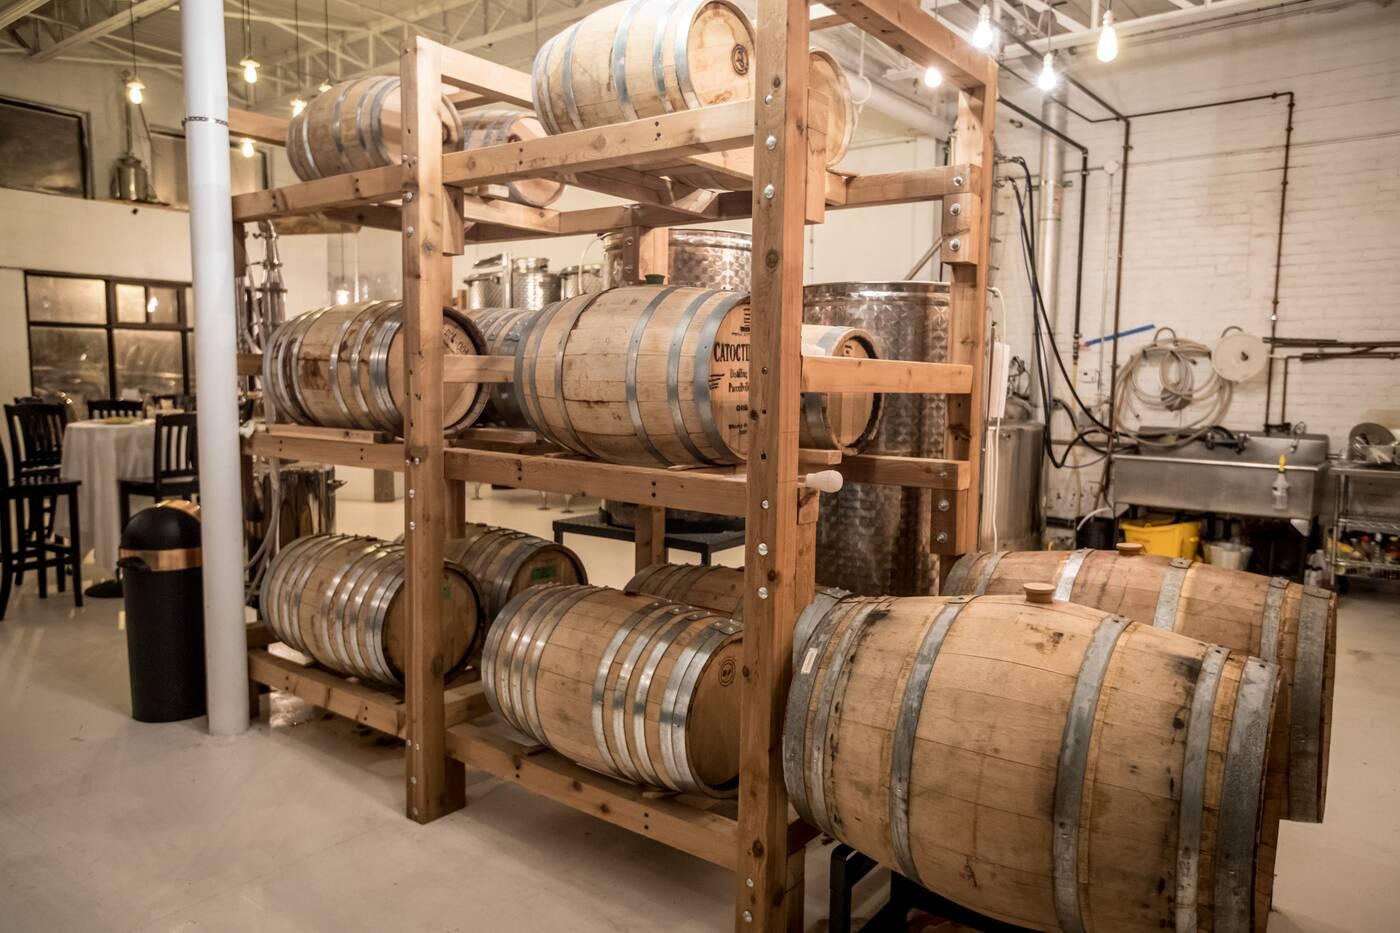 Nickel 9 Distillery